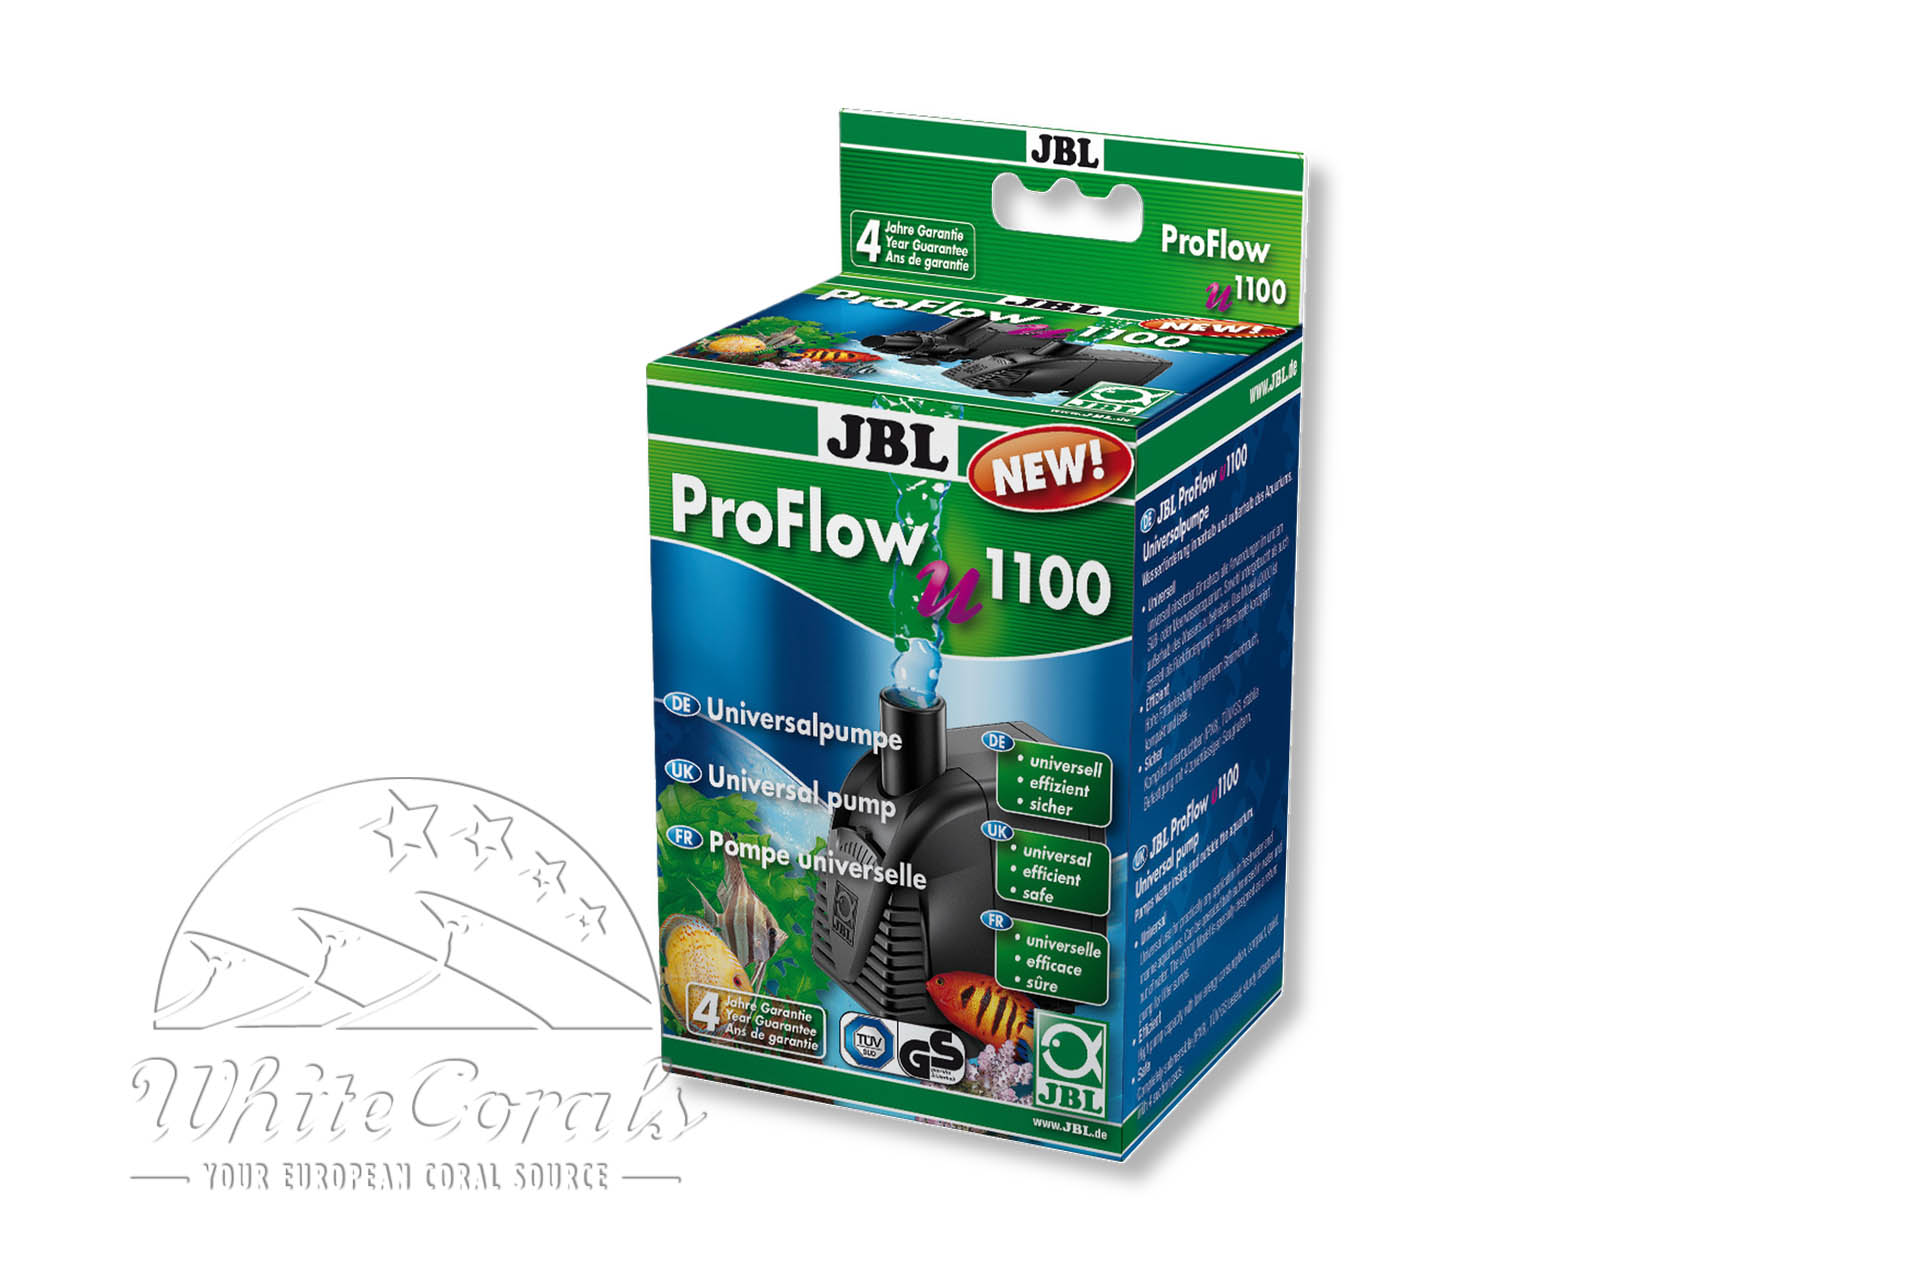 JBL ProFlow u1100 Universalpumpe